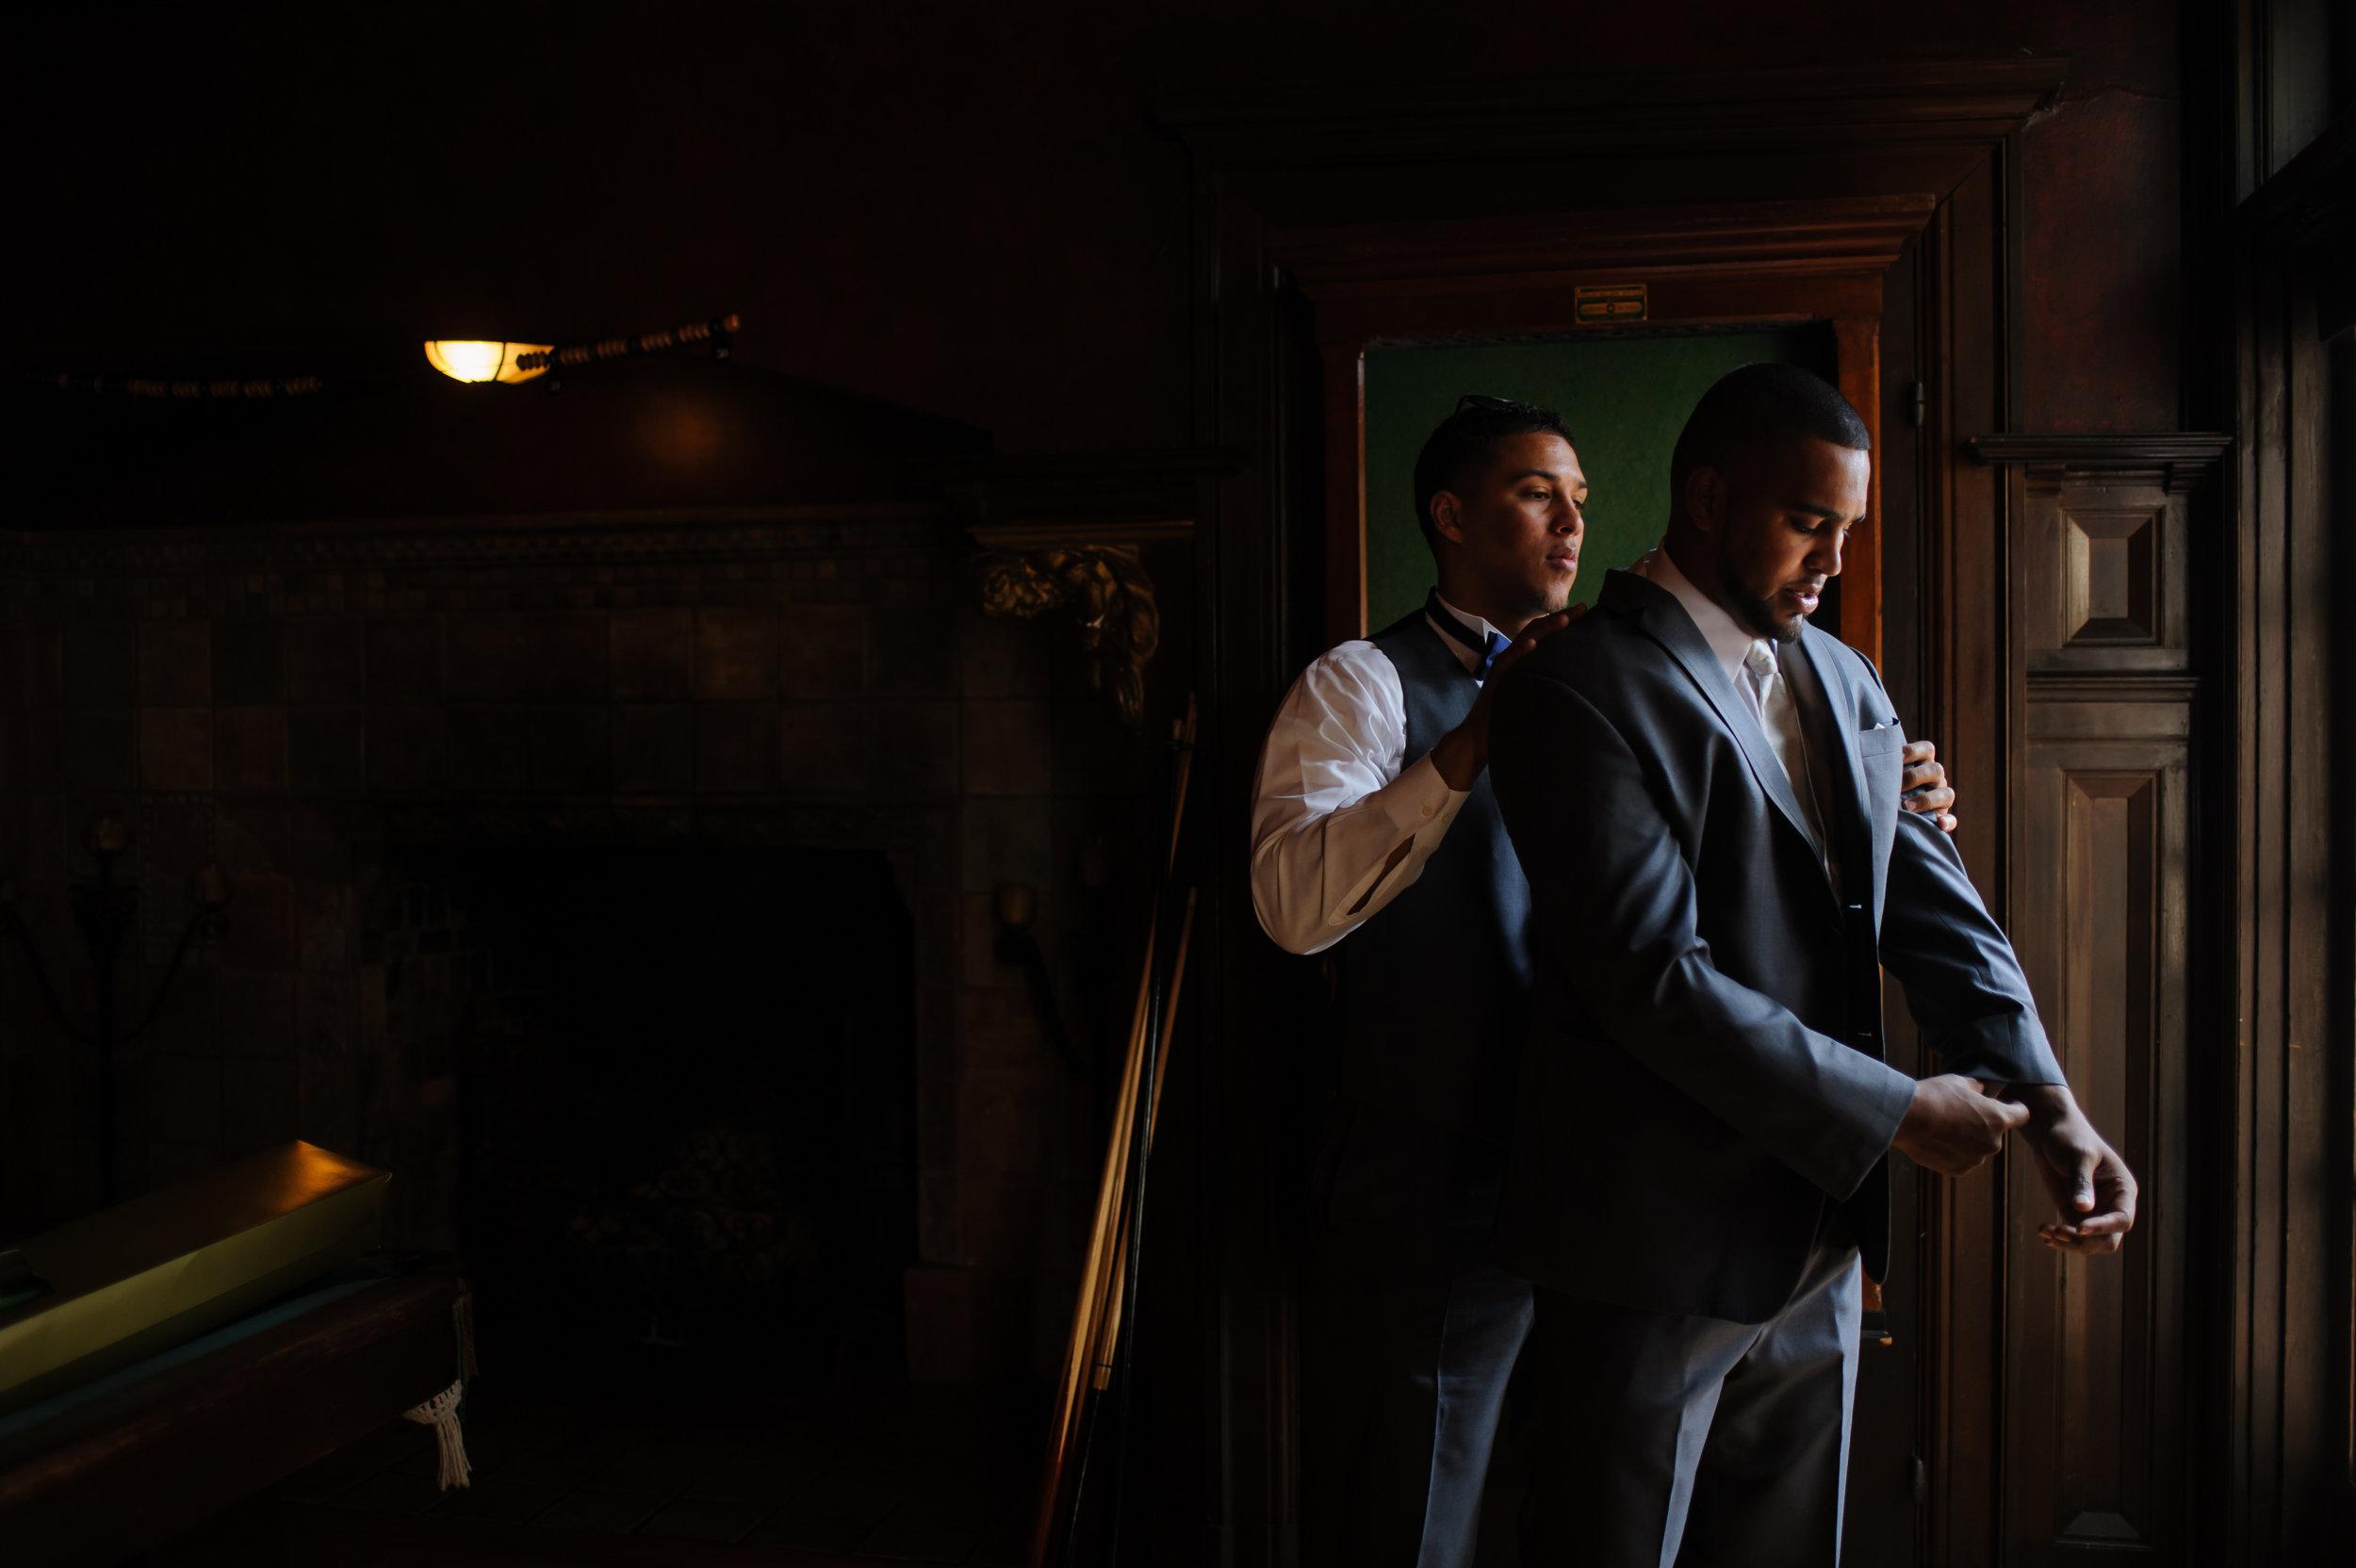 trina-cj-007-grand-island-mansion-sacramento-wedding-photographer-katherine-nicole-photography.JPG